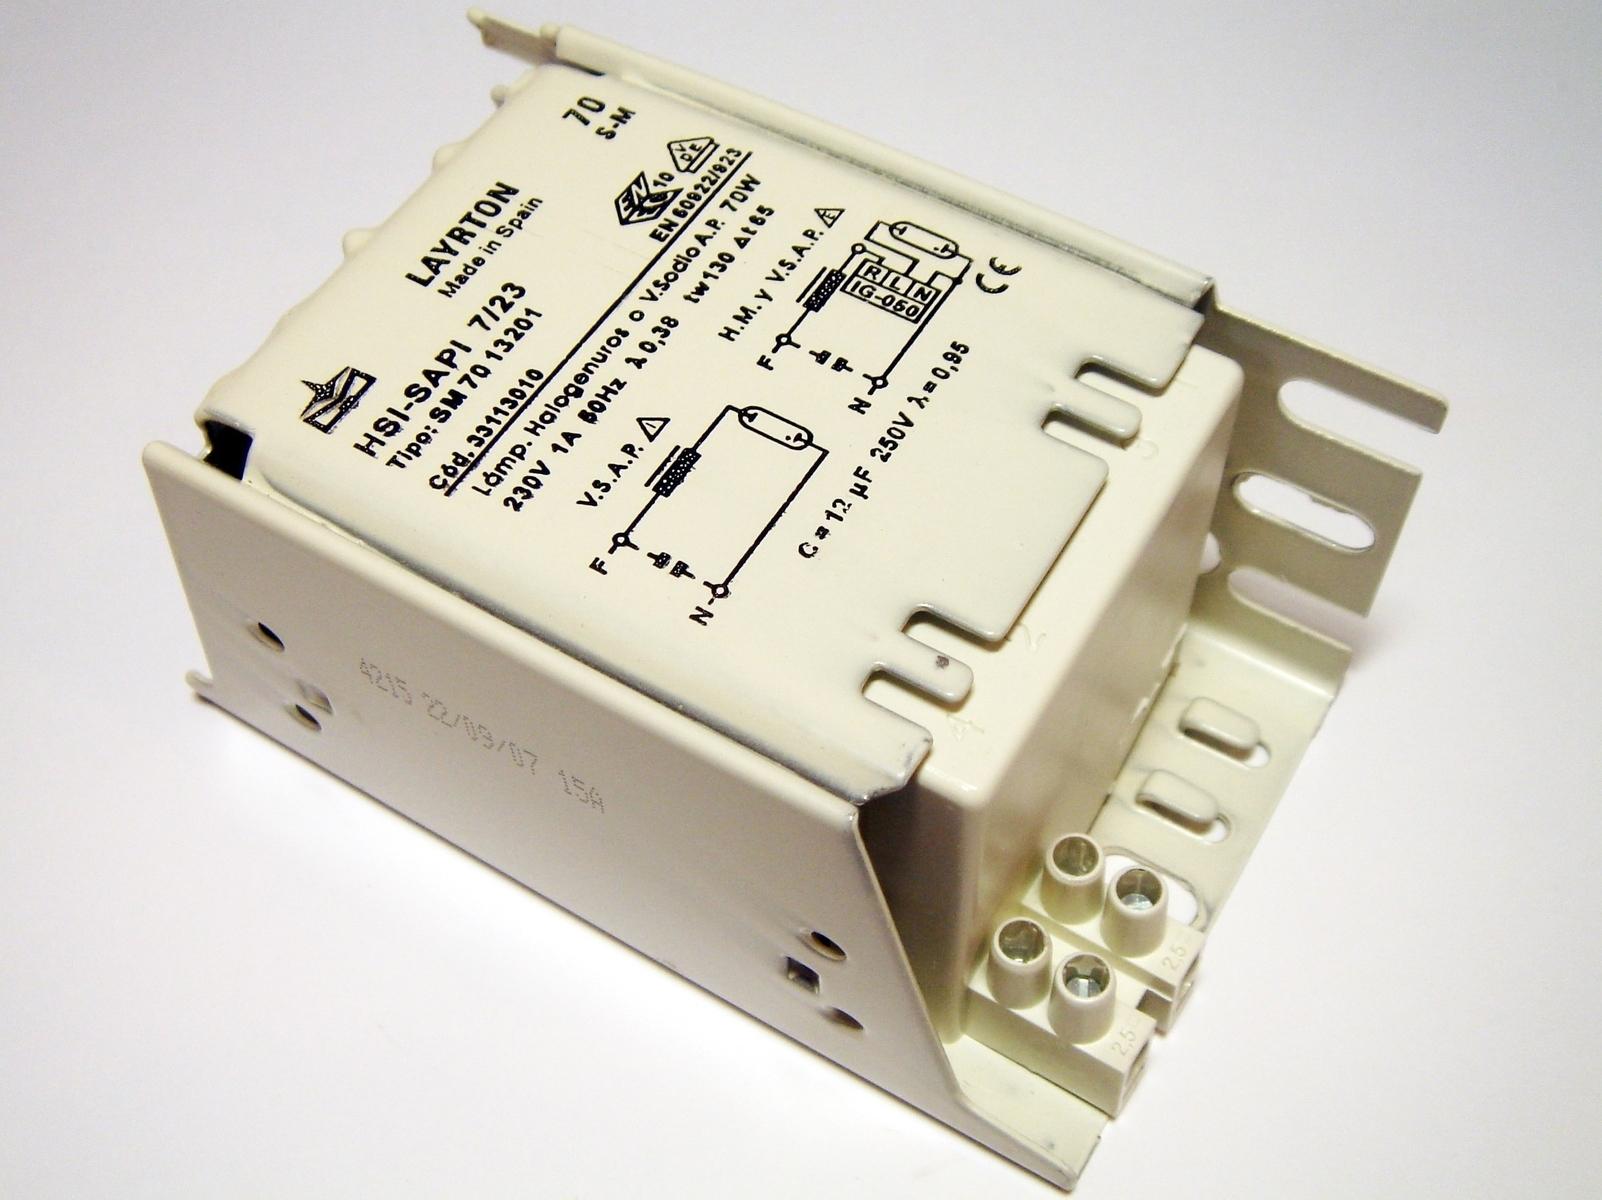 Ballast 70 W, HSI-SAPI 7/23, Layrton SM70 13201, 33113010